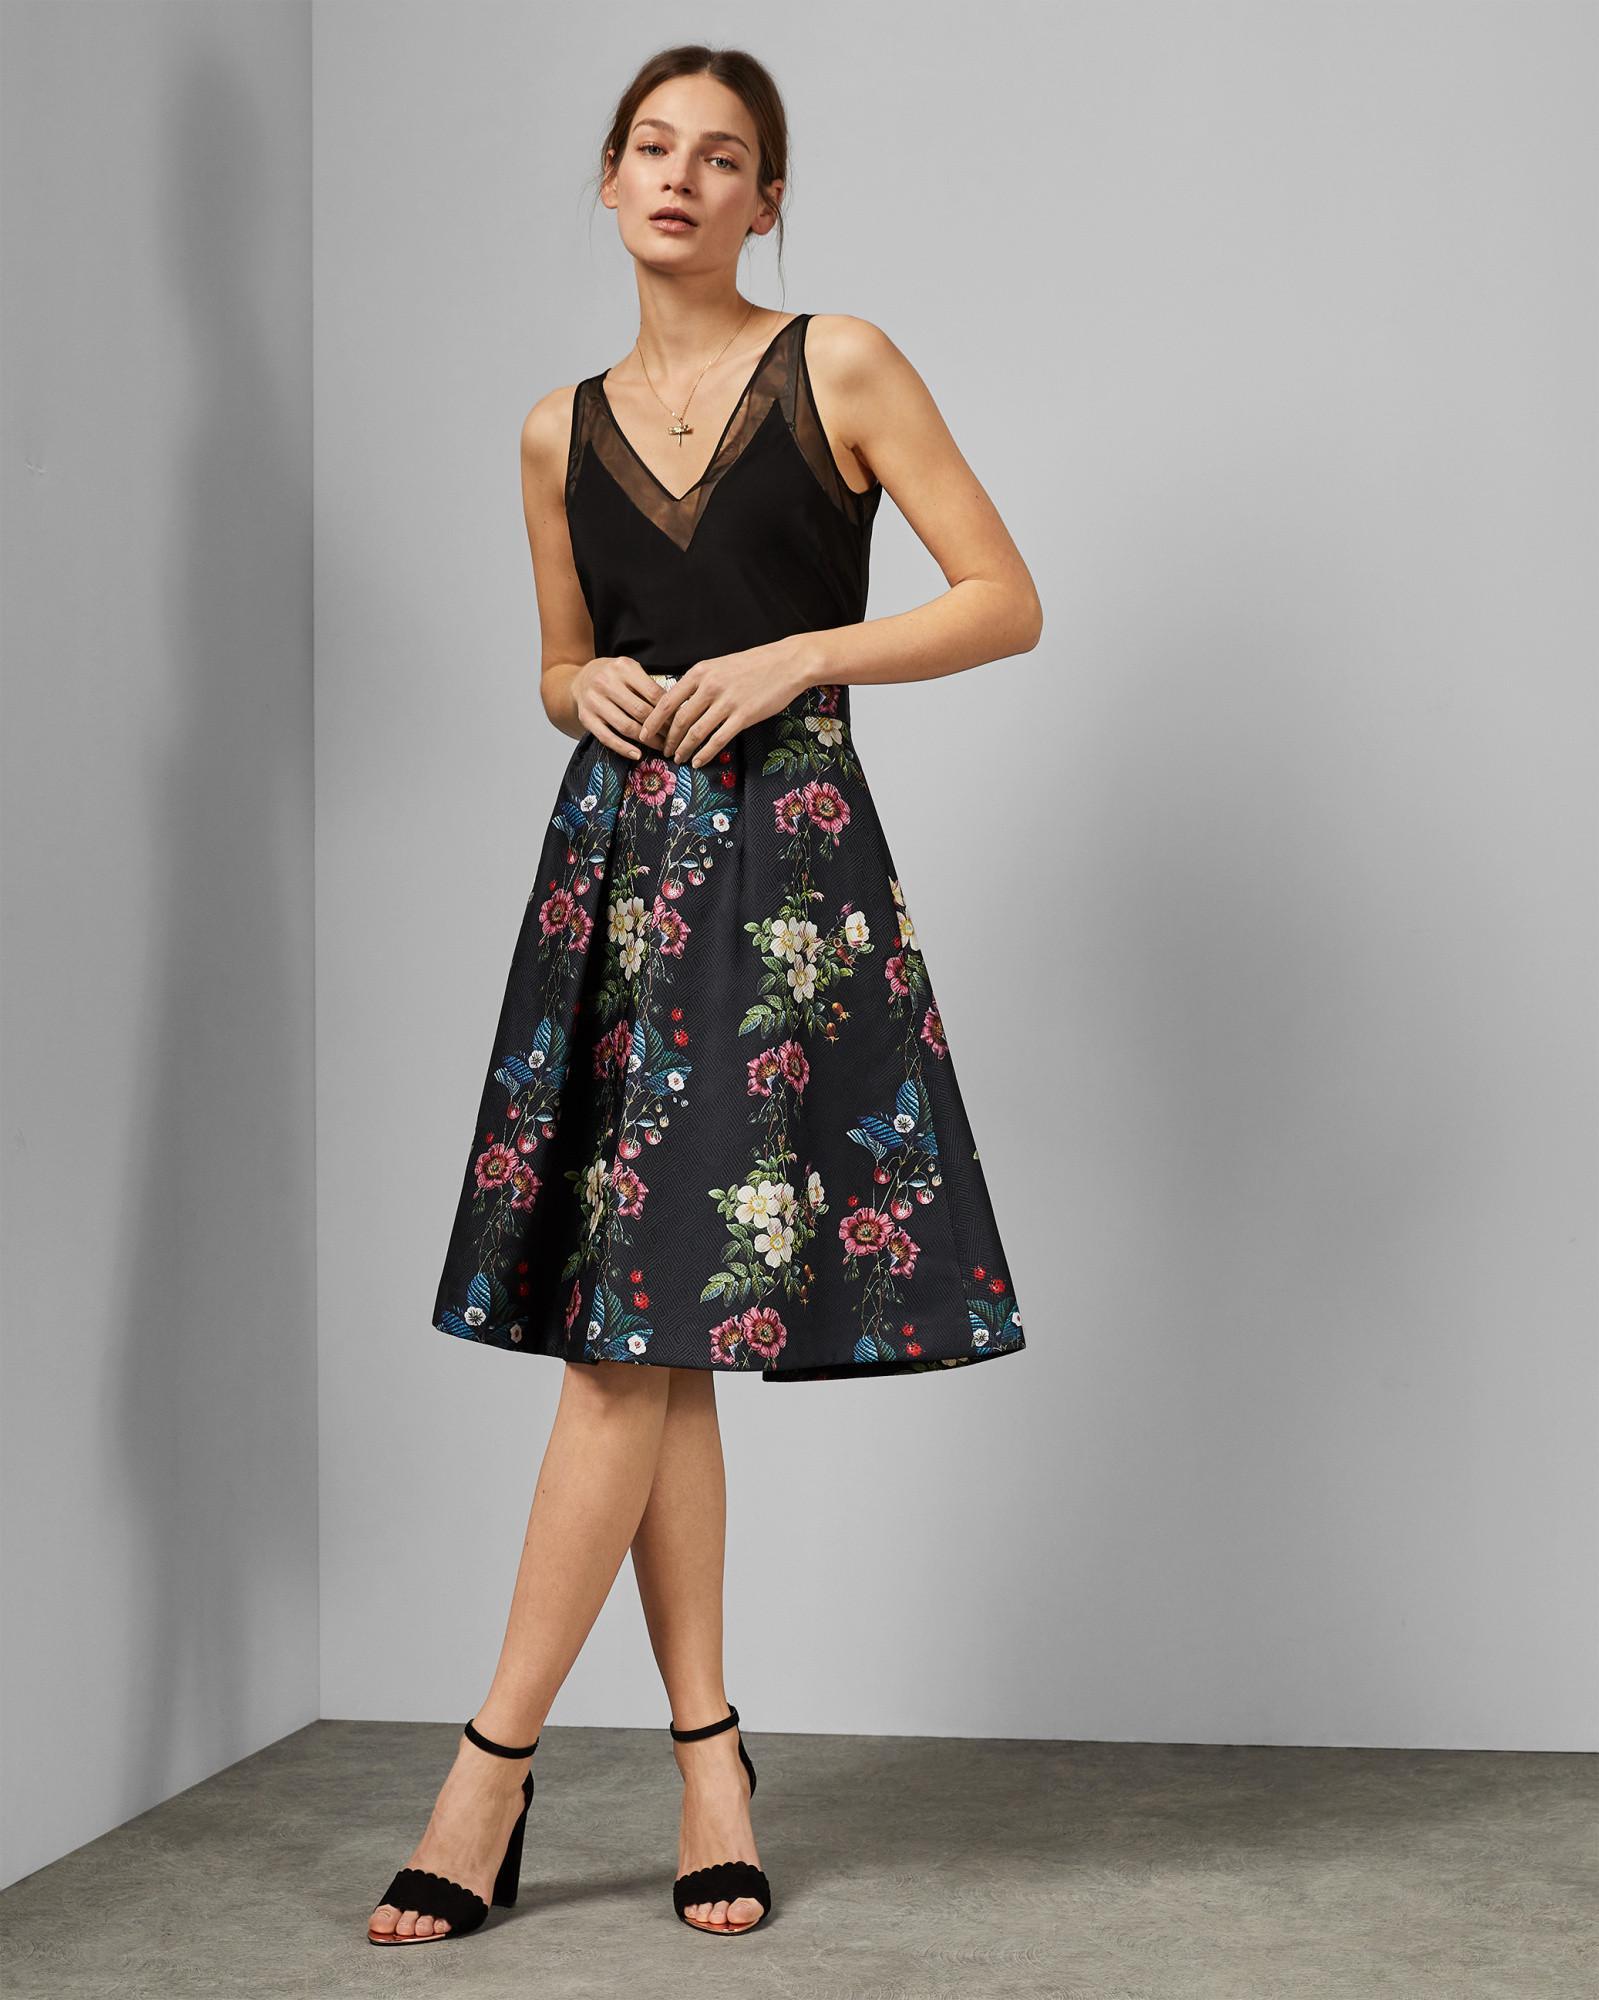 5ae54c50c5e06 Lyst - Ted Baker Oracle Full Skirt in Black - Save 30%